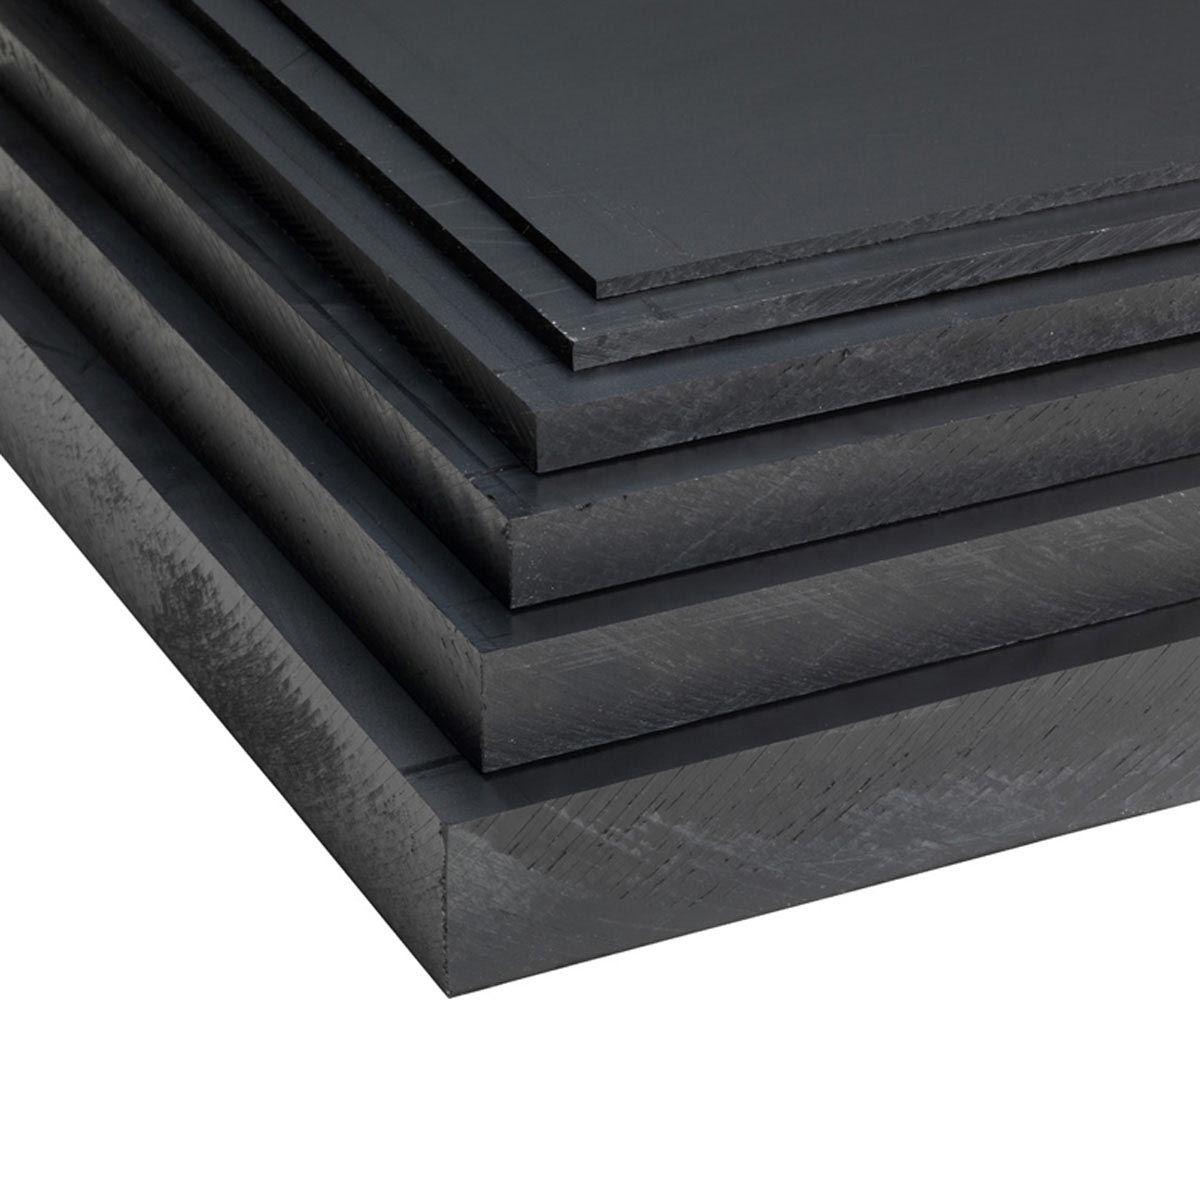 PE Platte, aus PE, schwarz, 2000 x 1000 x 3 mm, PE 80, 2.91 kg/m2